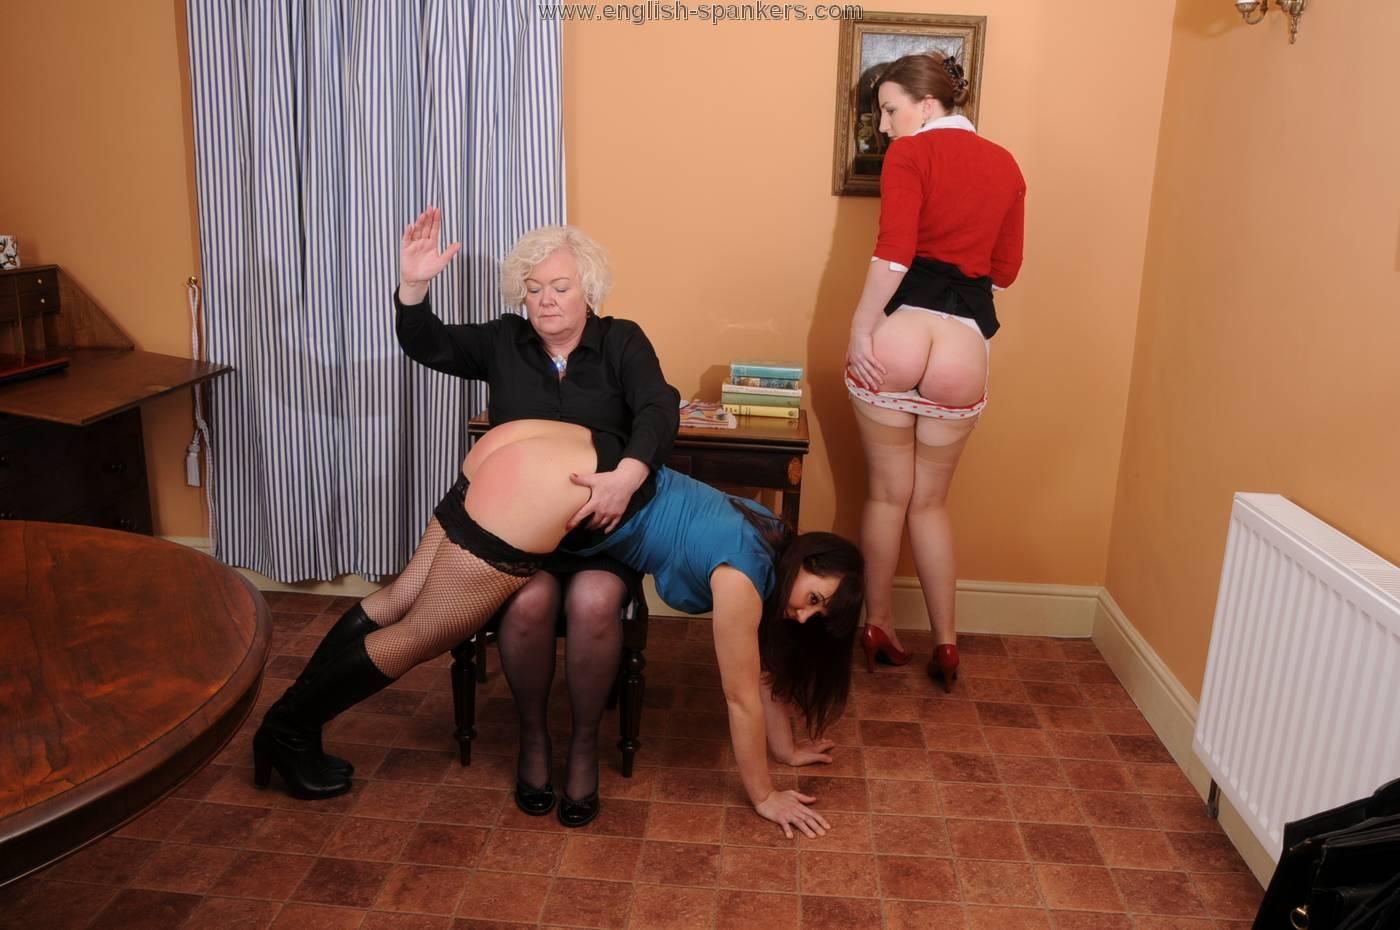 Mature spank galleries